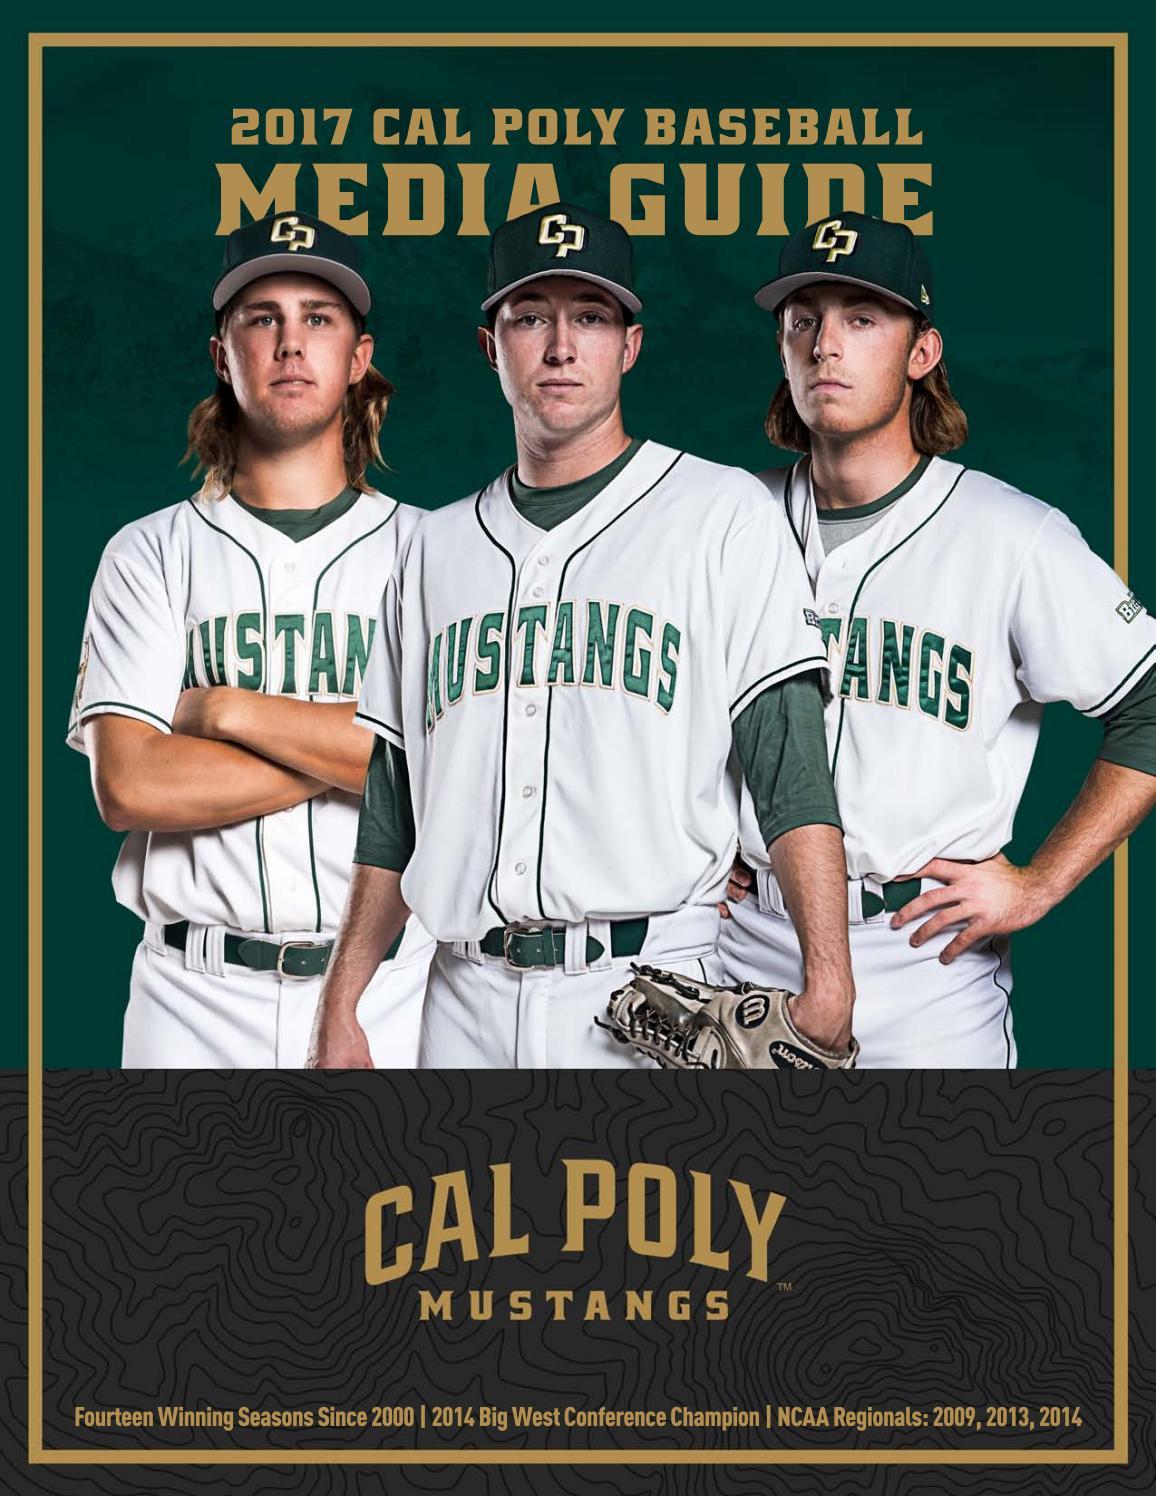 fe00b35b9f0 2017 Cal Poly Baseball Media Guide by Cal Poly Athletics - issuu